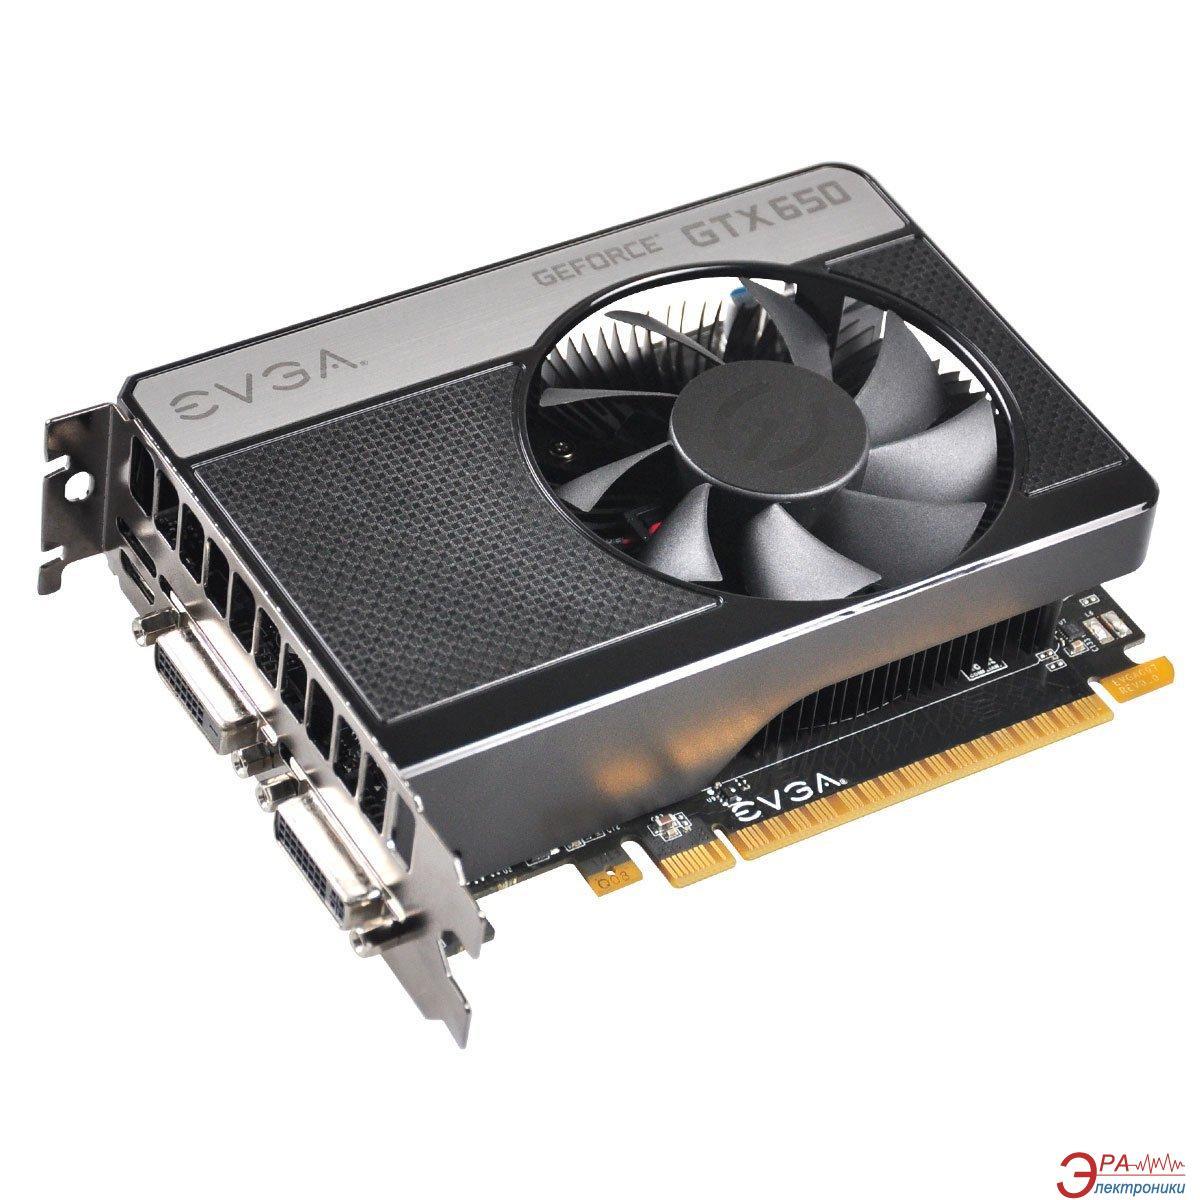 Видеокарта EVGA Nvidia GeForce GTX 650 Superclocked GDDR5 1024 Мб (01G-P4-2652-KR)